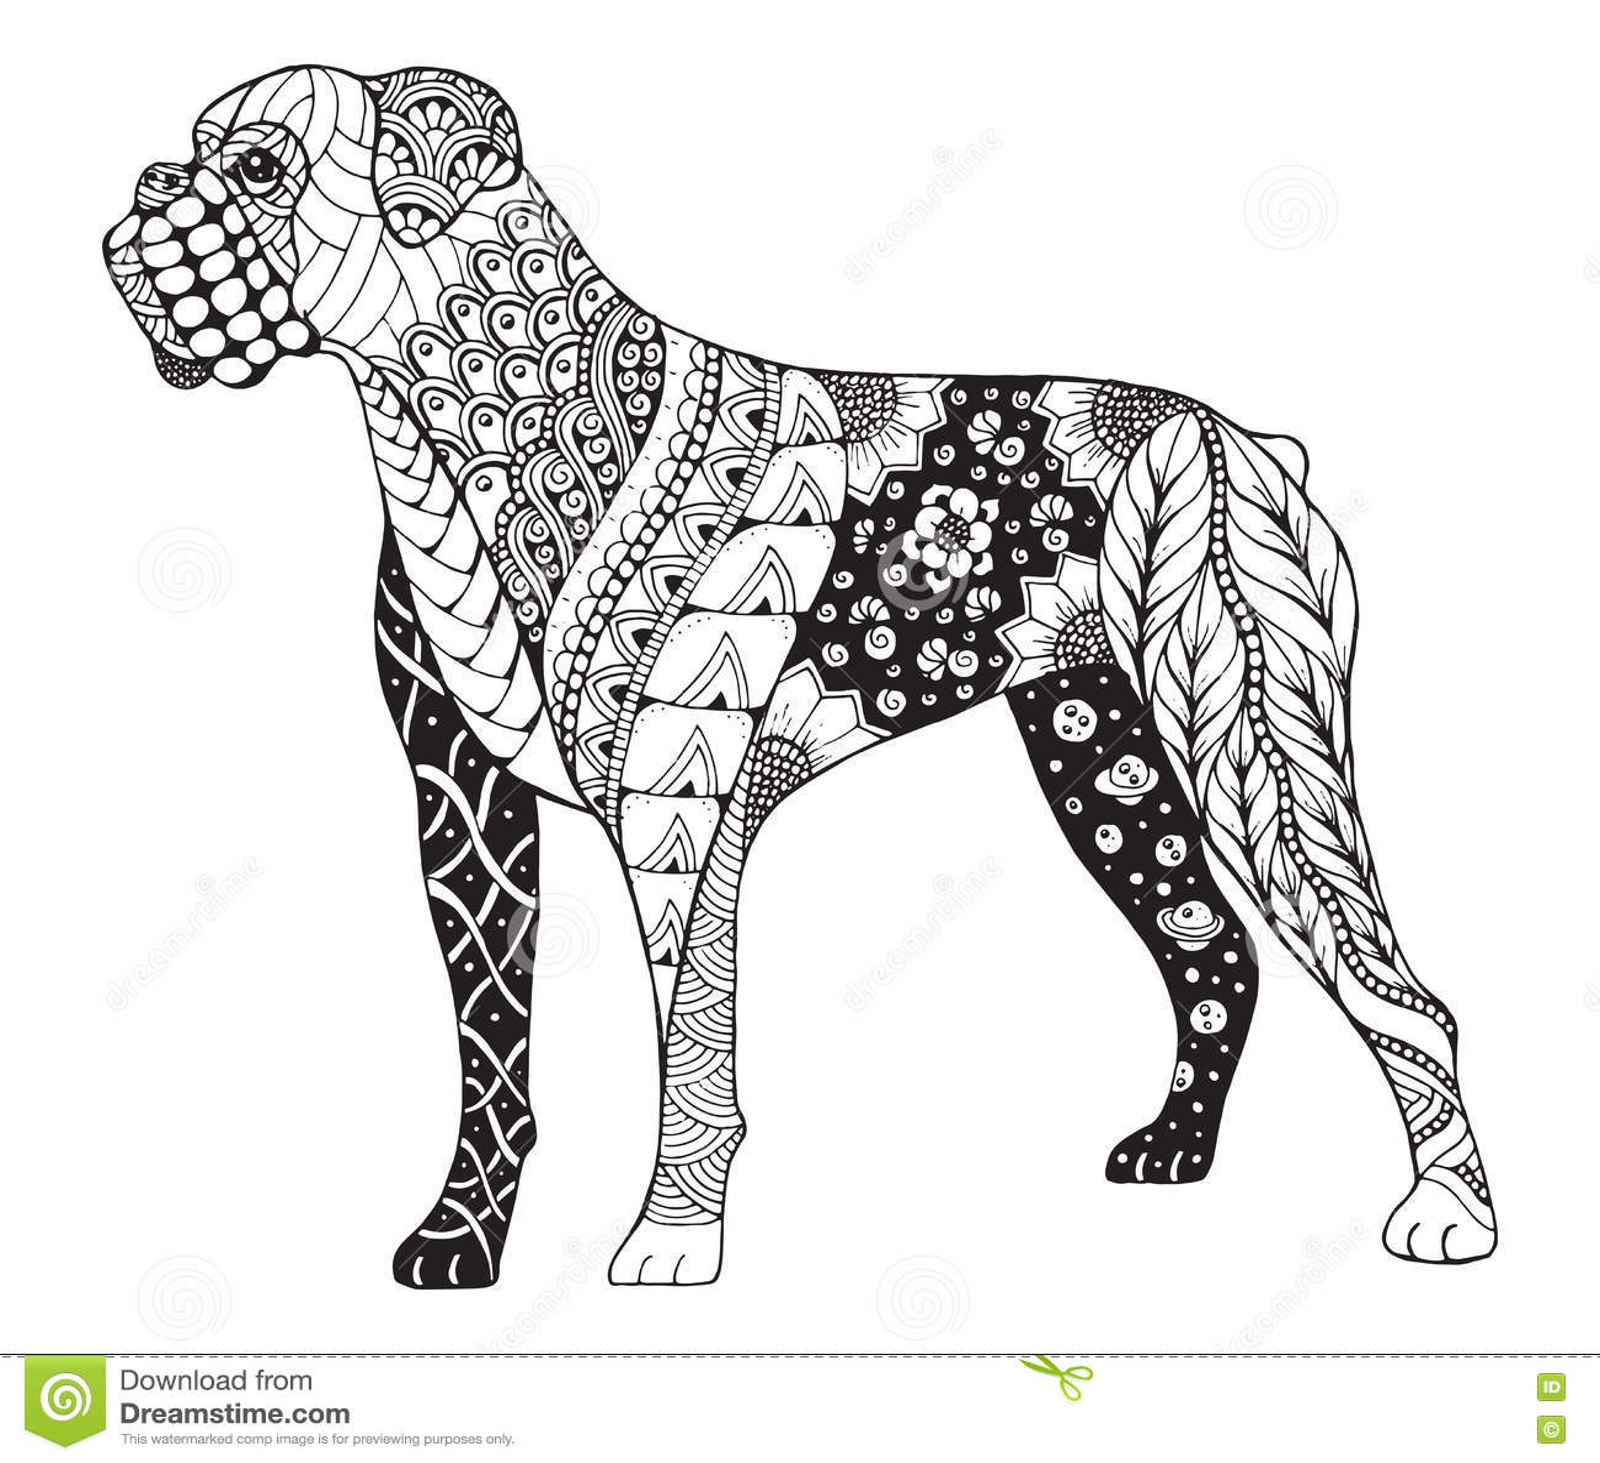 Boxerhund Zentangle Stilisierte Vector Illustration